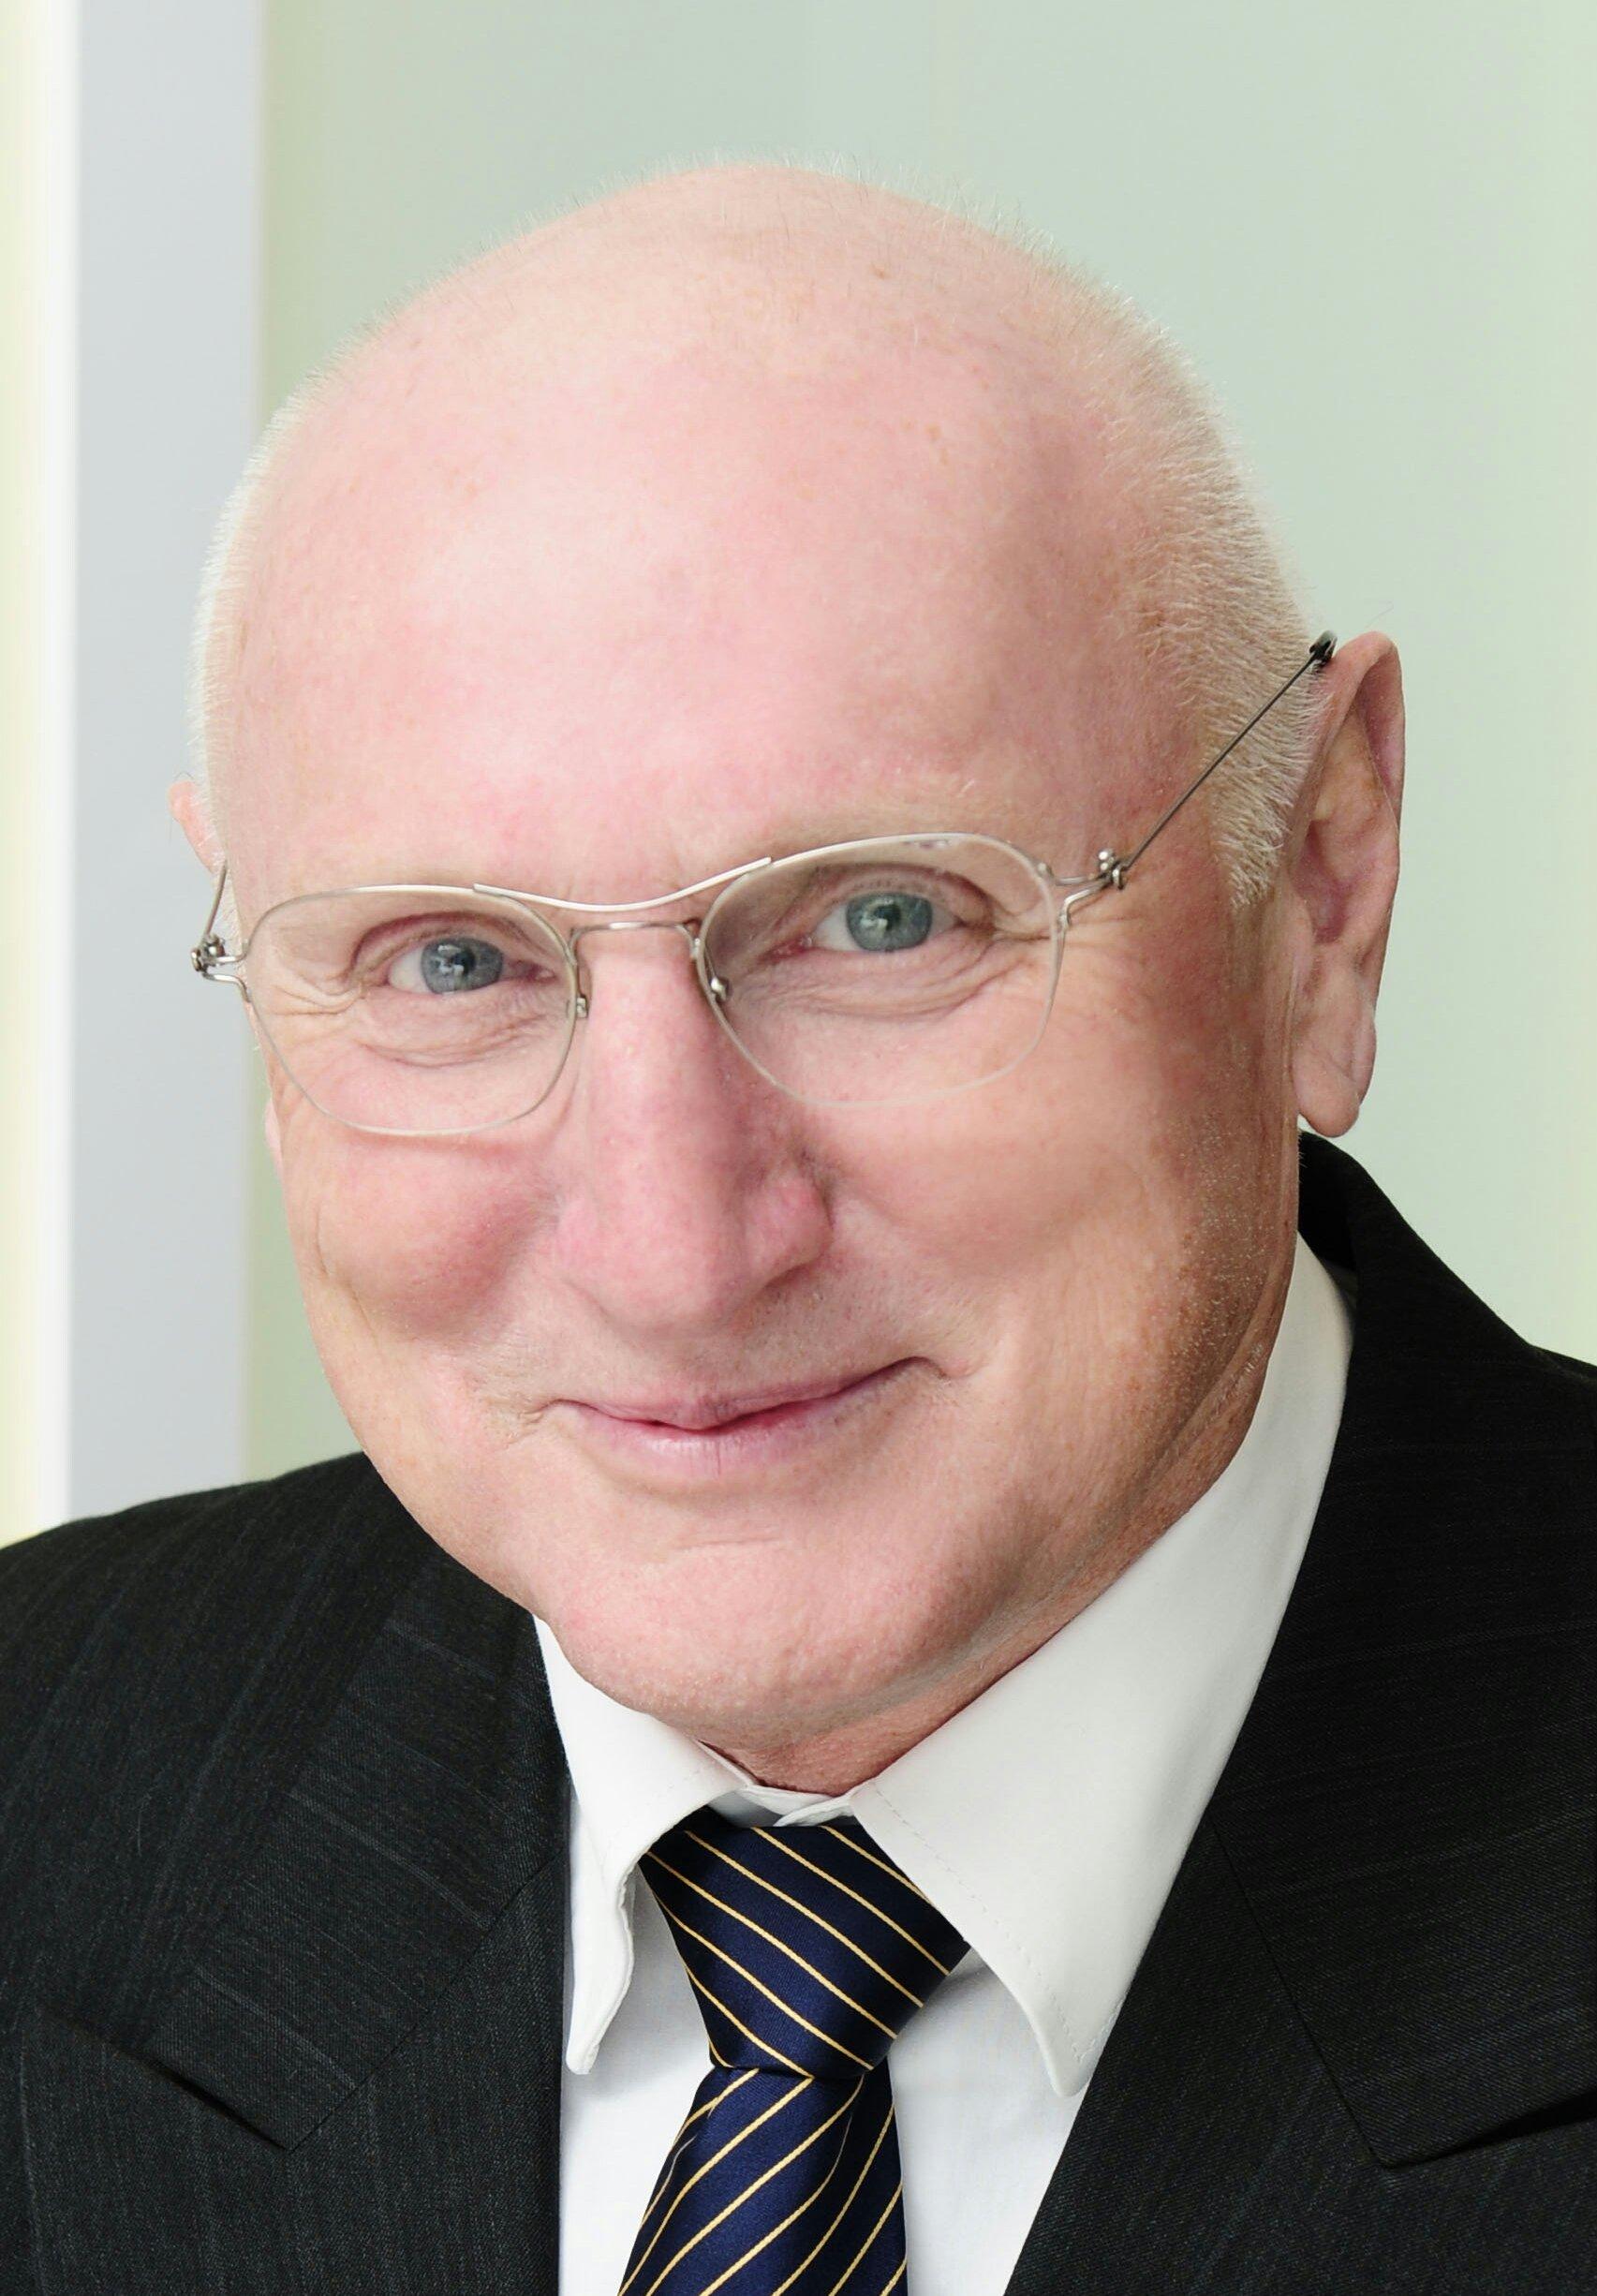 Rechtsanwalt Roman Noack Fachanwalt für Familienrecht und Erbrecht